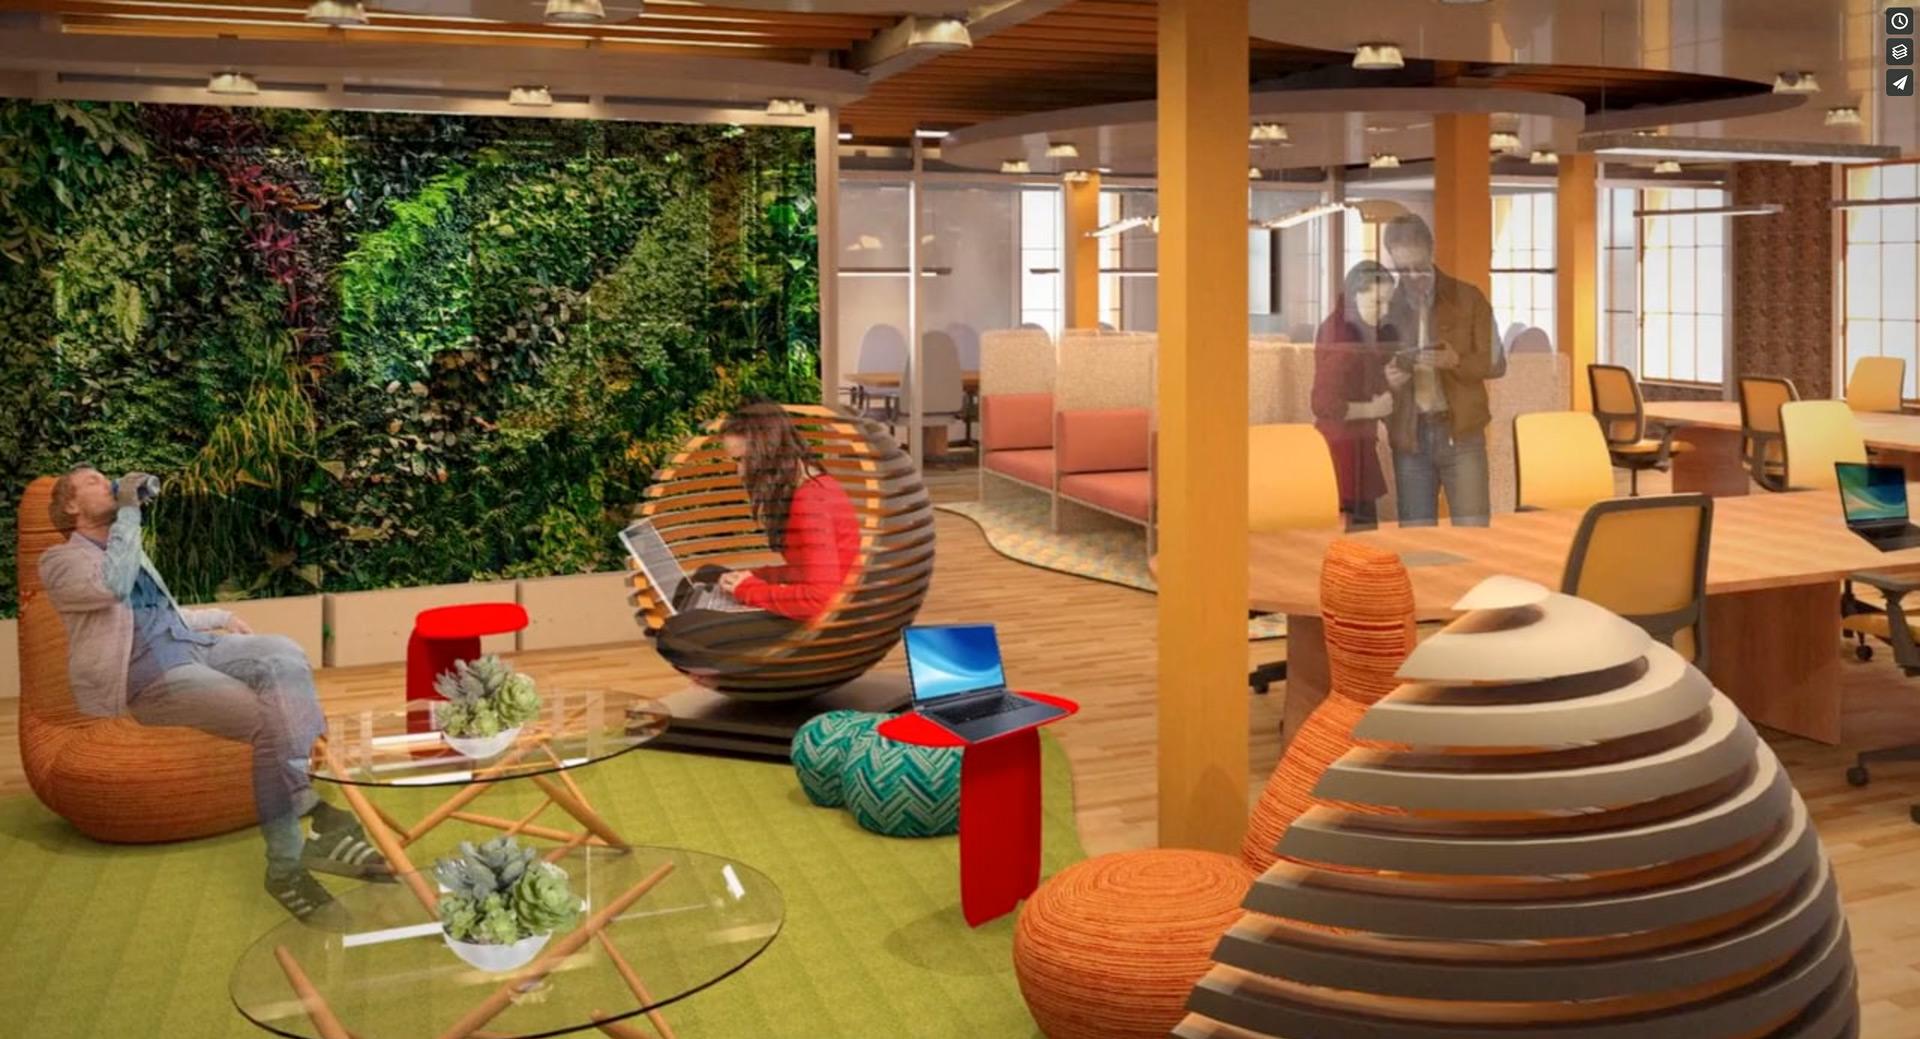 Scad interior design student work - Interior decorator students for hire ...